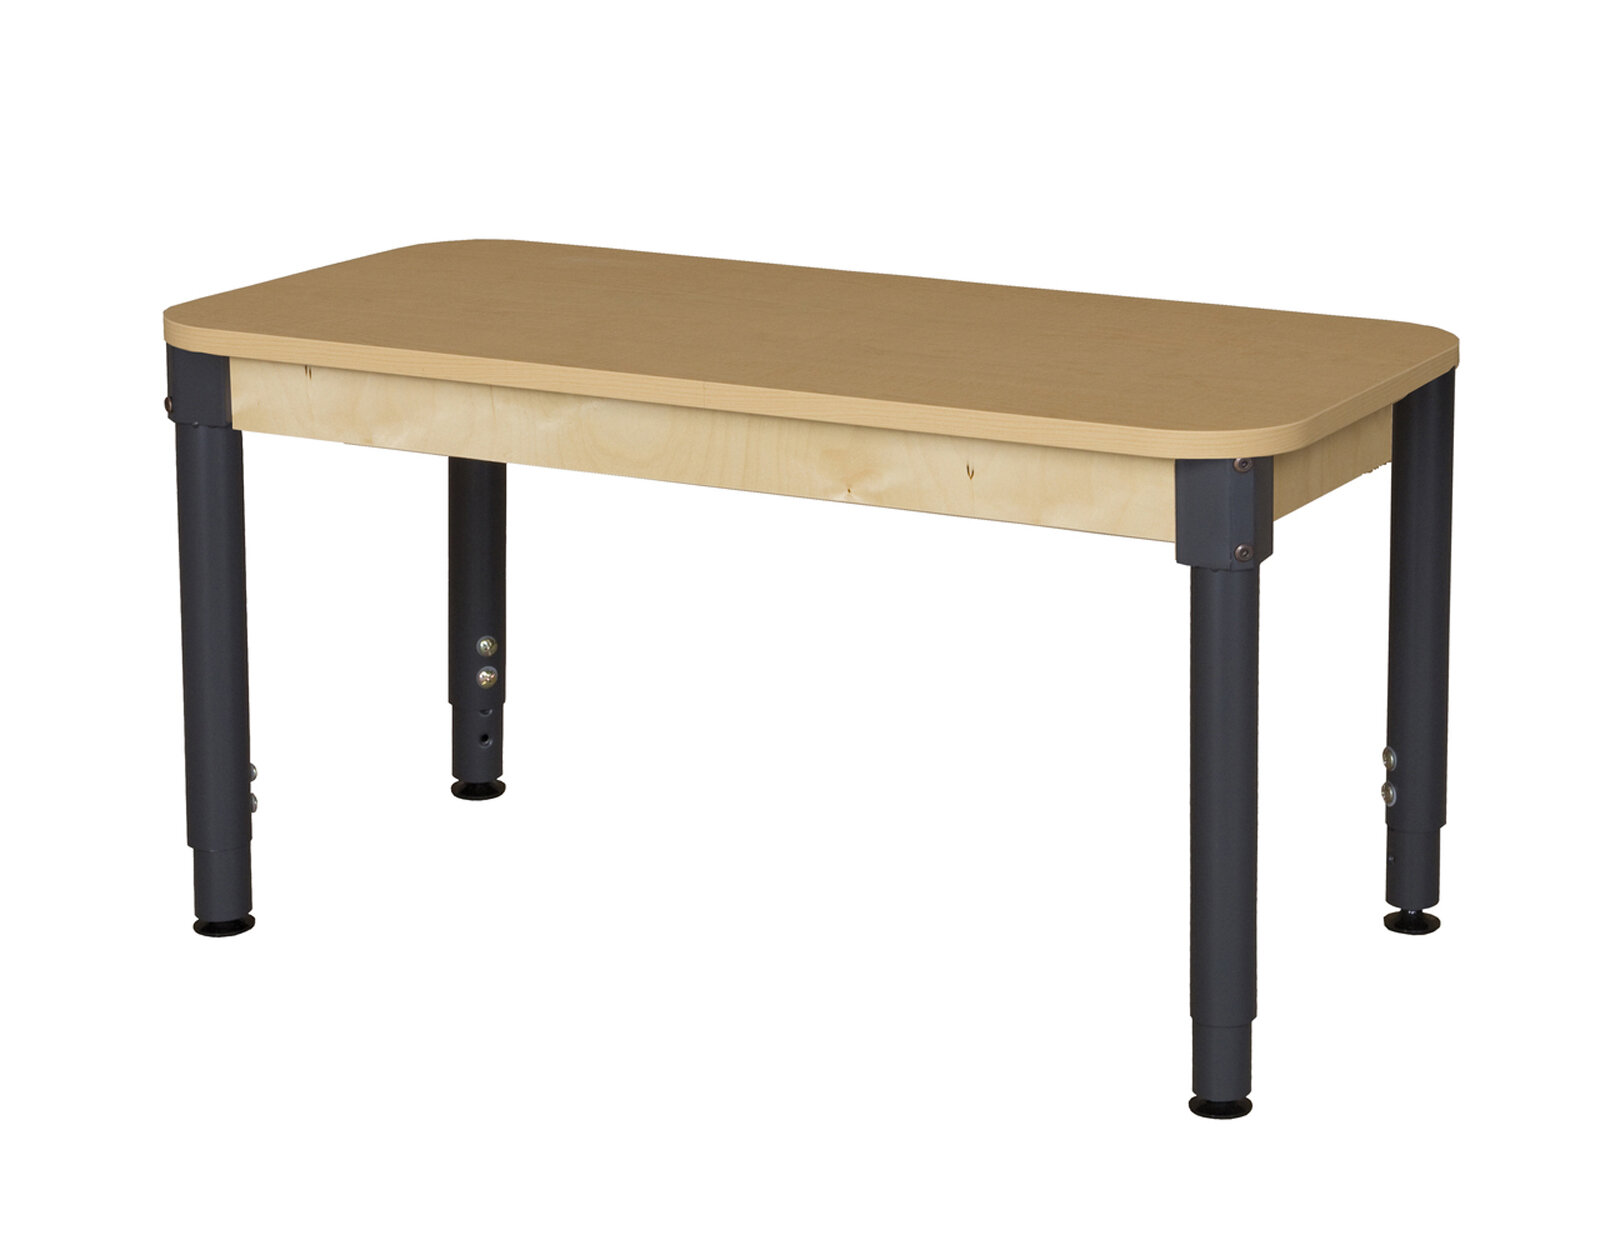 Wood Designs Rectangle High Pressure Laminate Table (Adjustable Legs) |  Wayfair